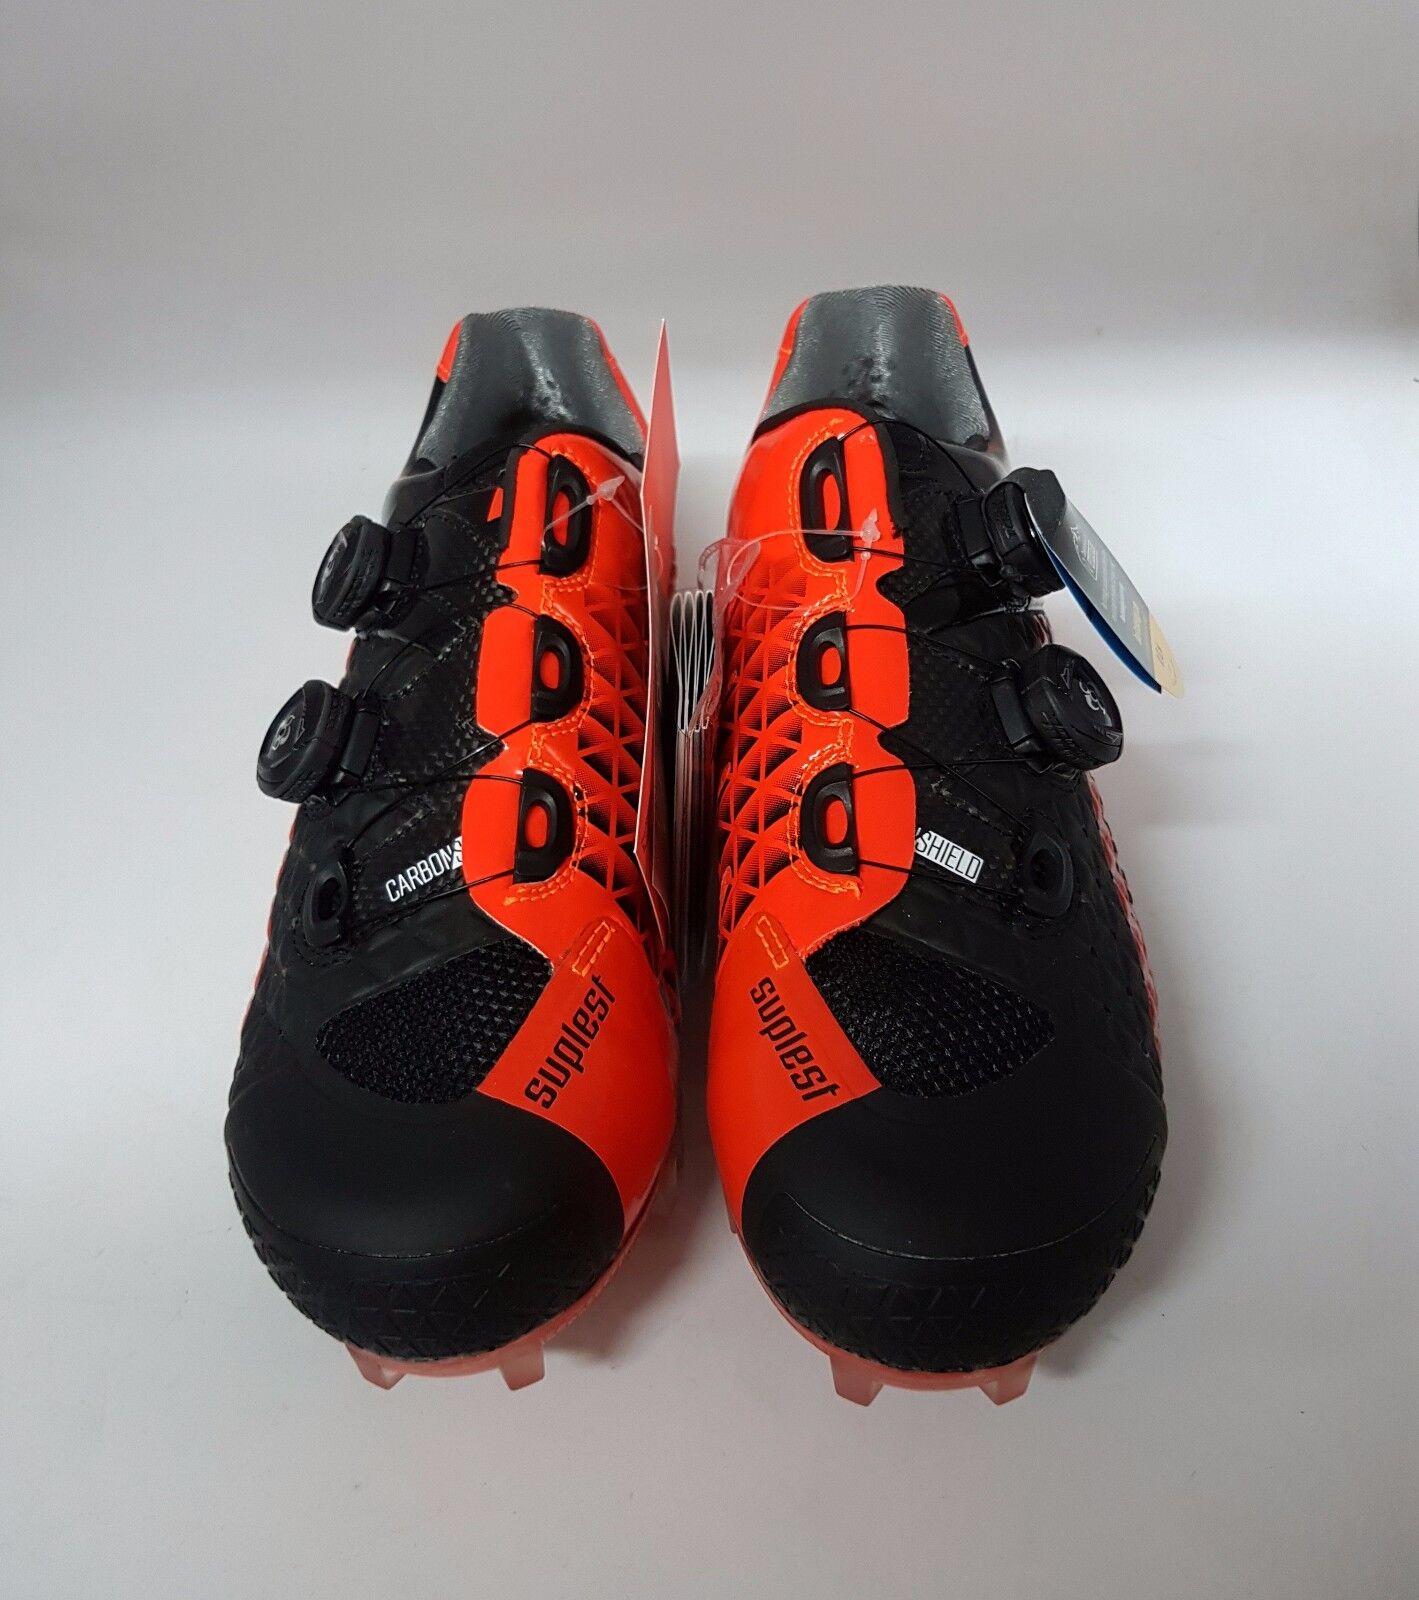 Suplest borde 3 TXC Pro CrossCountry Cochebono Mountain bike Zapatos Neón Naranja Negro Talla 43